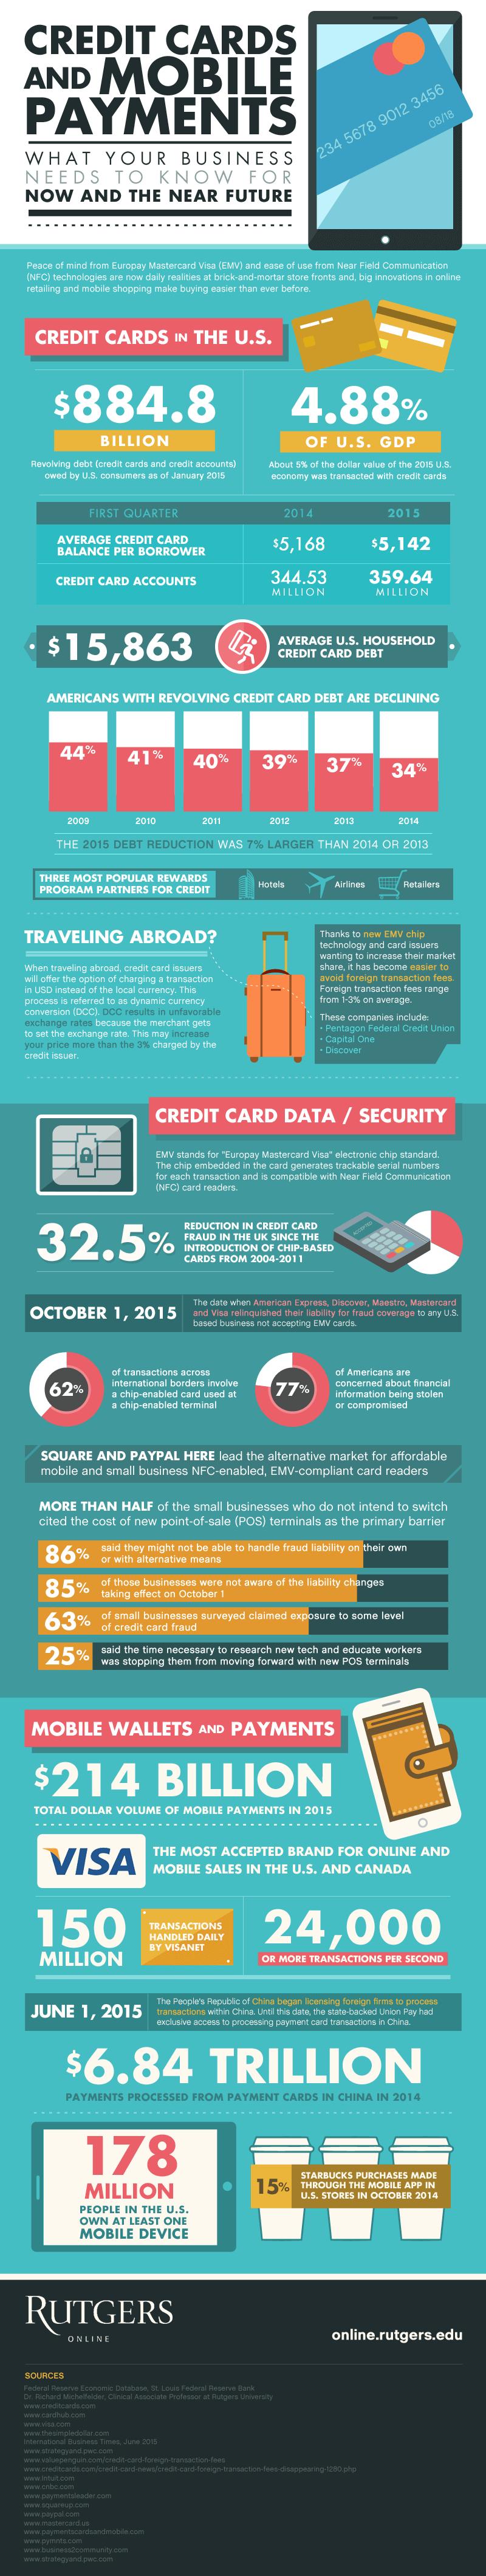 Credit-Card-Mobile-Payment set 29